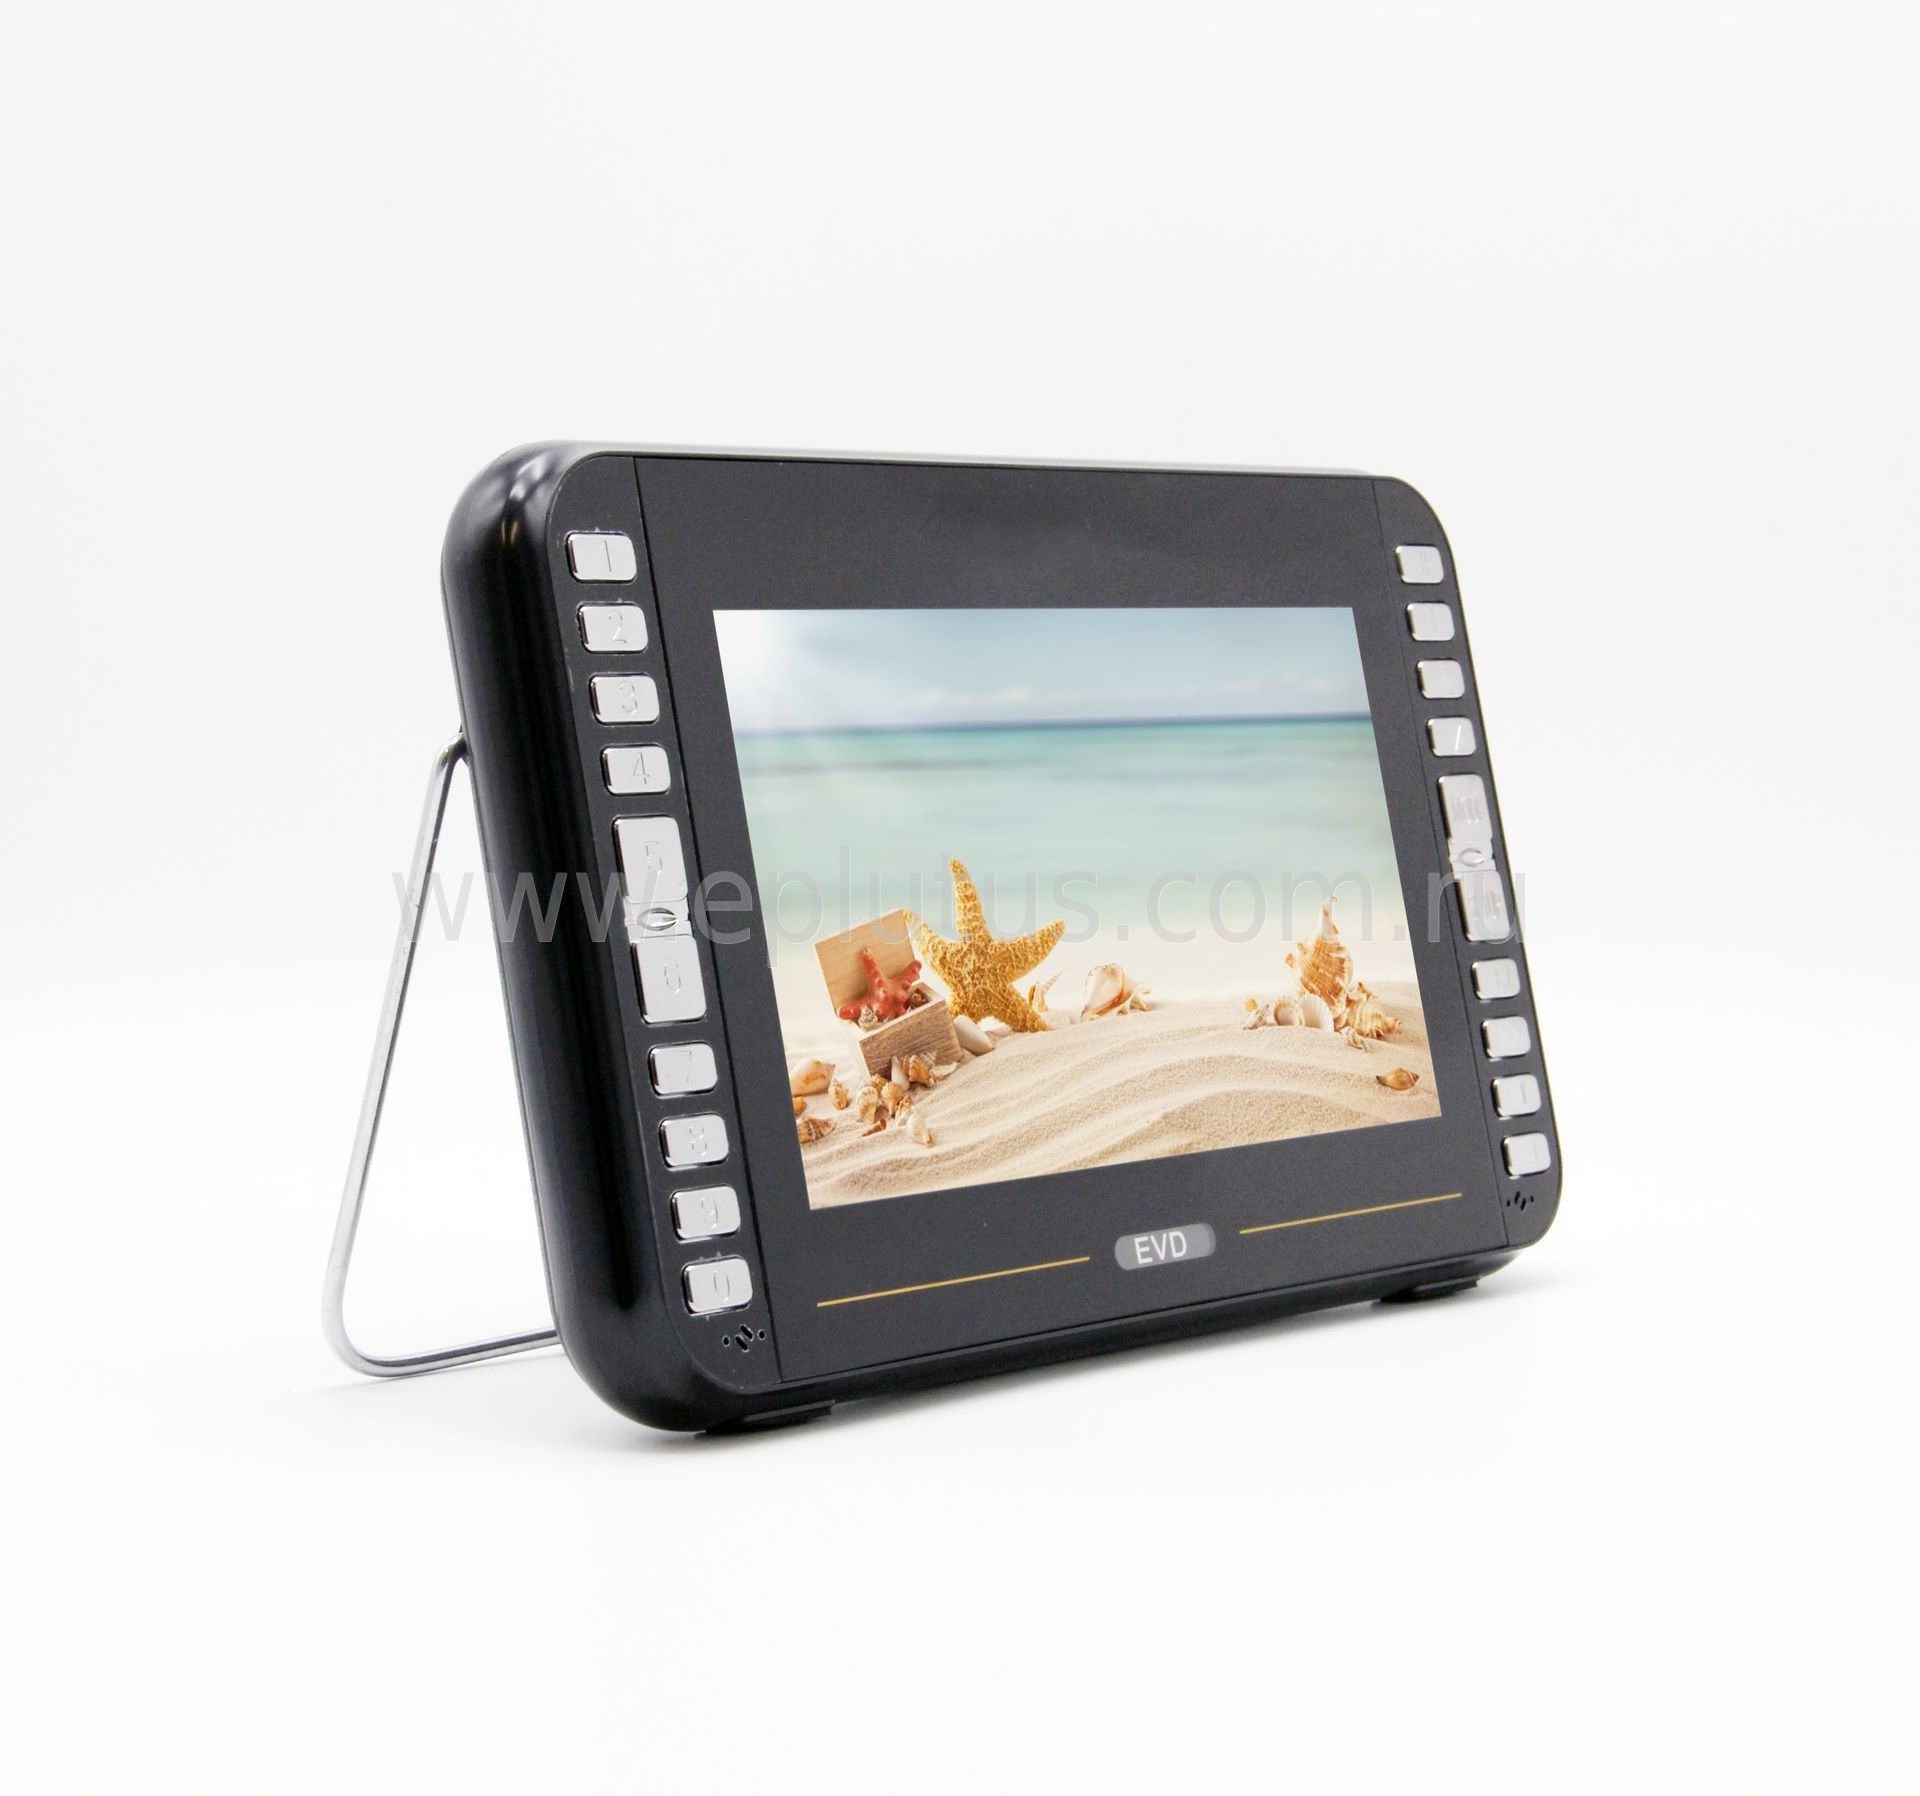 DVD-плеер Eplutus LS-919Т philips philips dvd плеер cd плеер vcd плеер аудио плеер плеер usb возможность коррекции ошибок спикер черный dvp3000 93